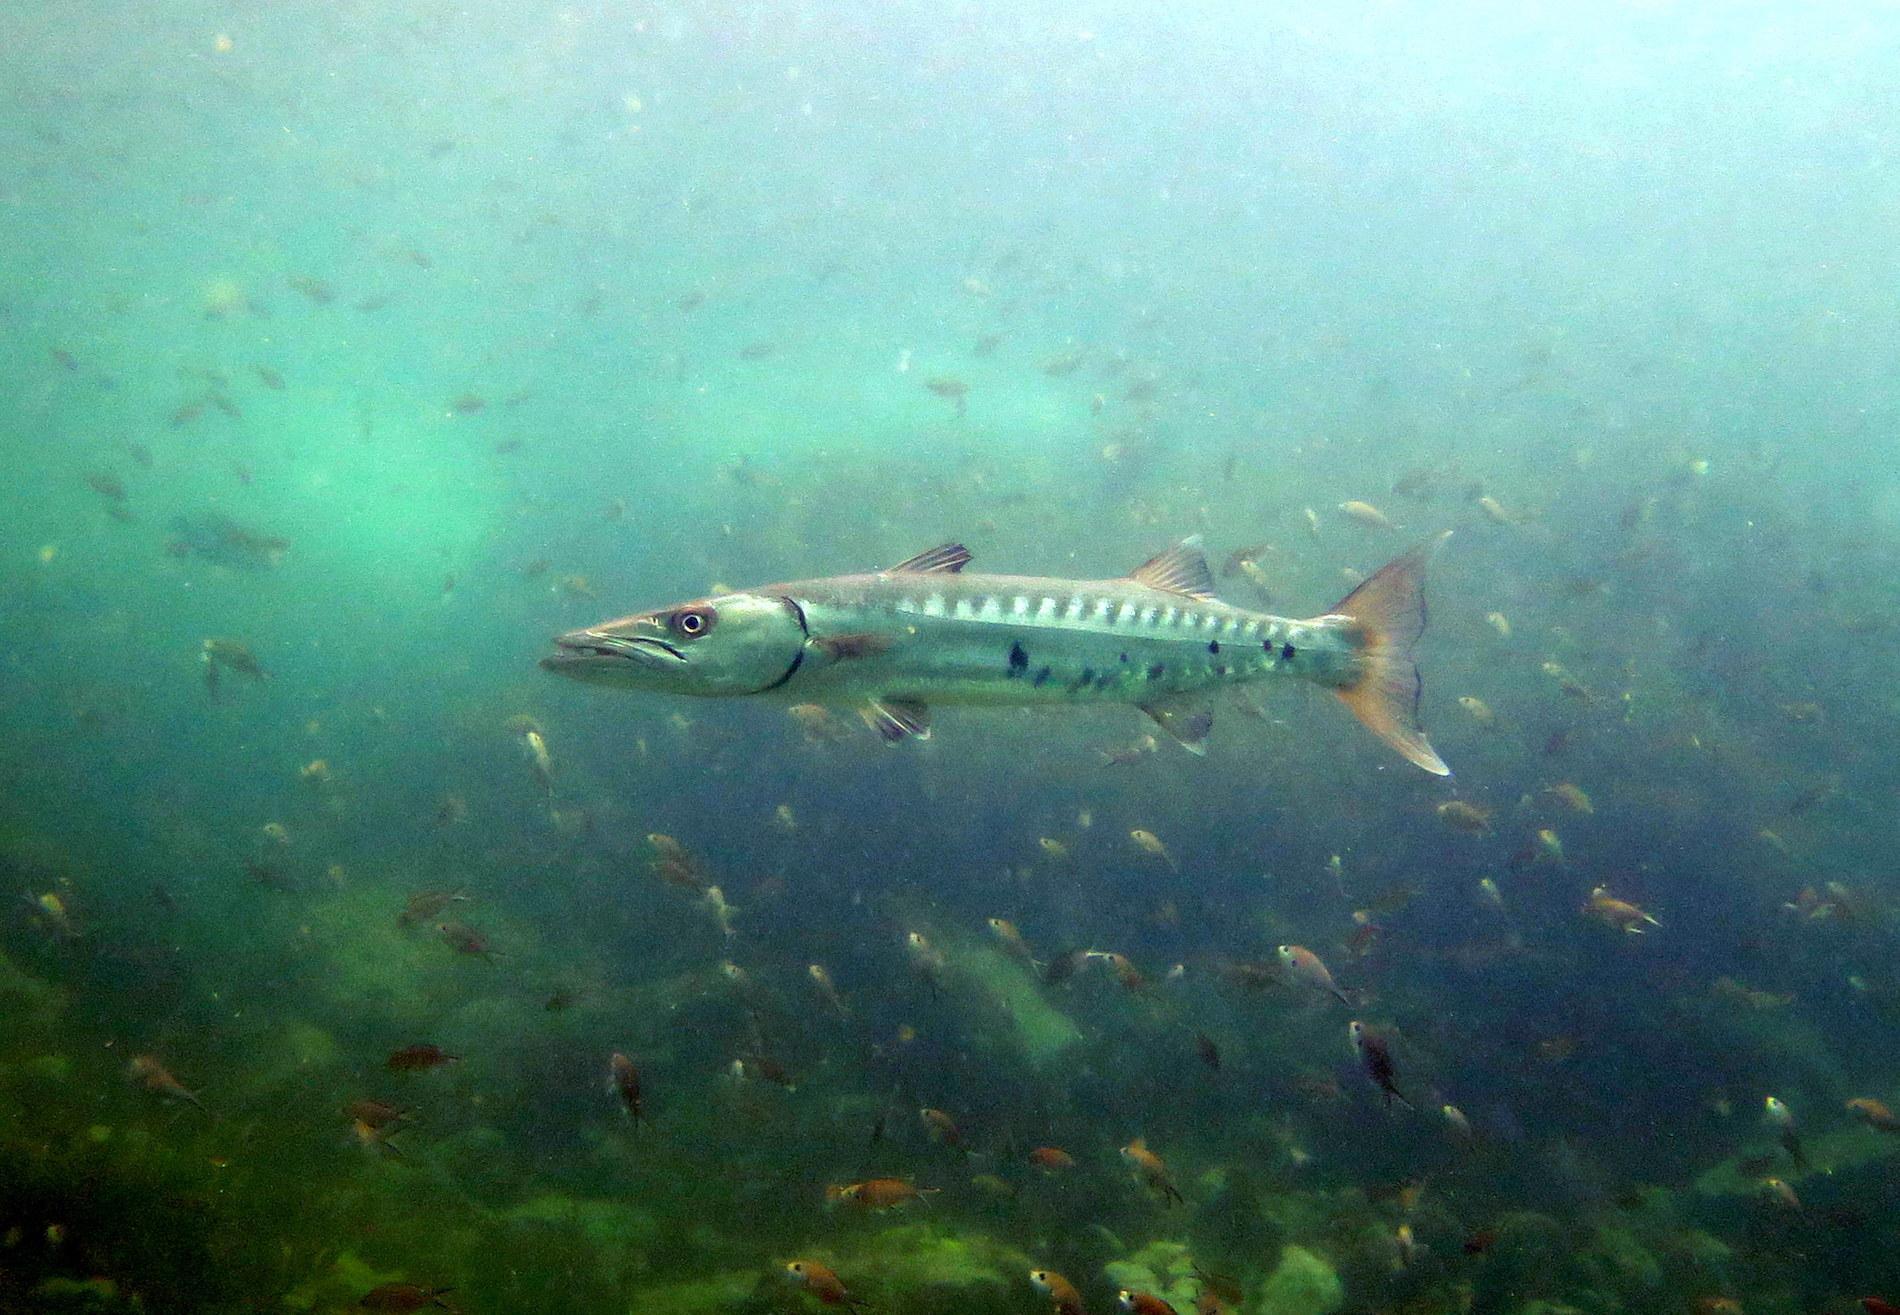 atmospheric shot of a barracuda